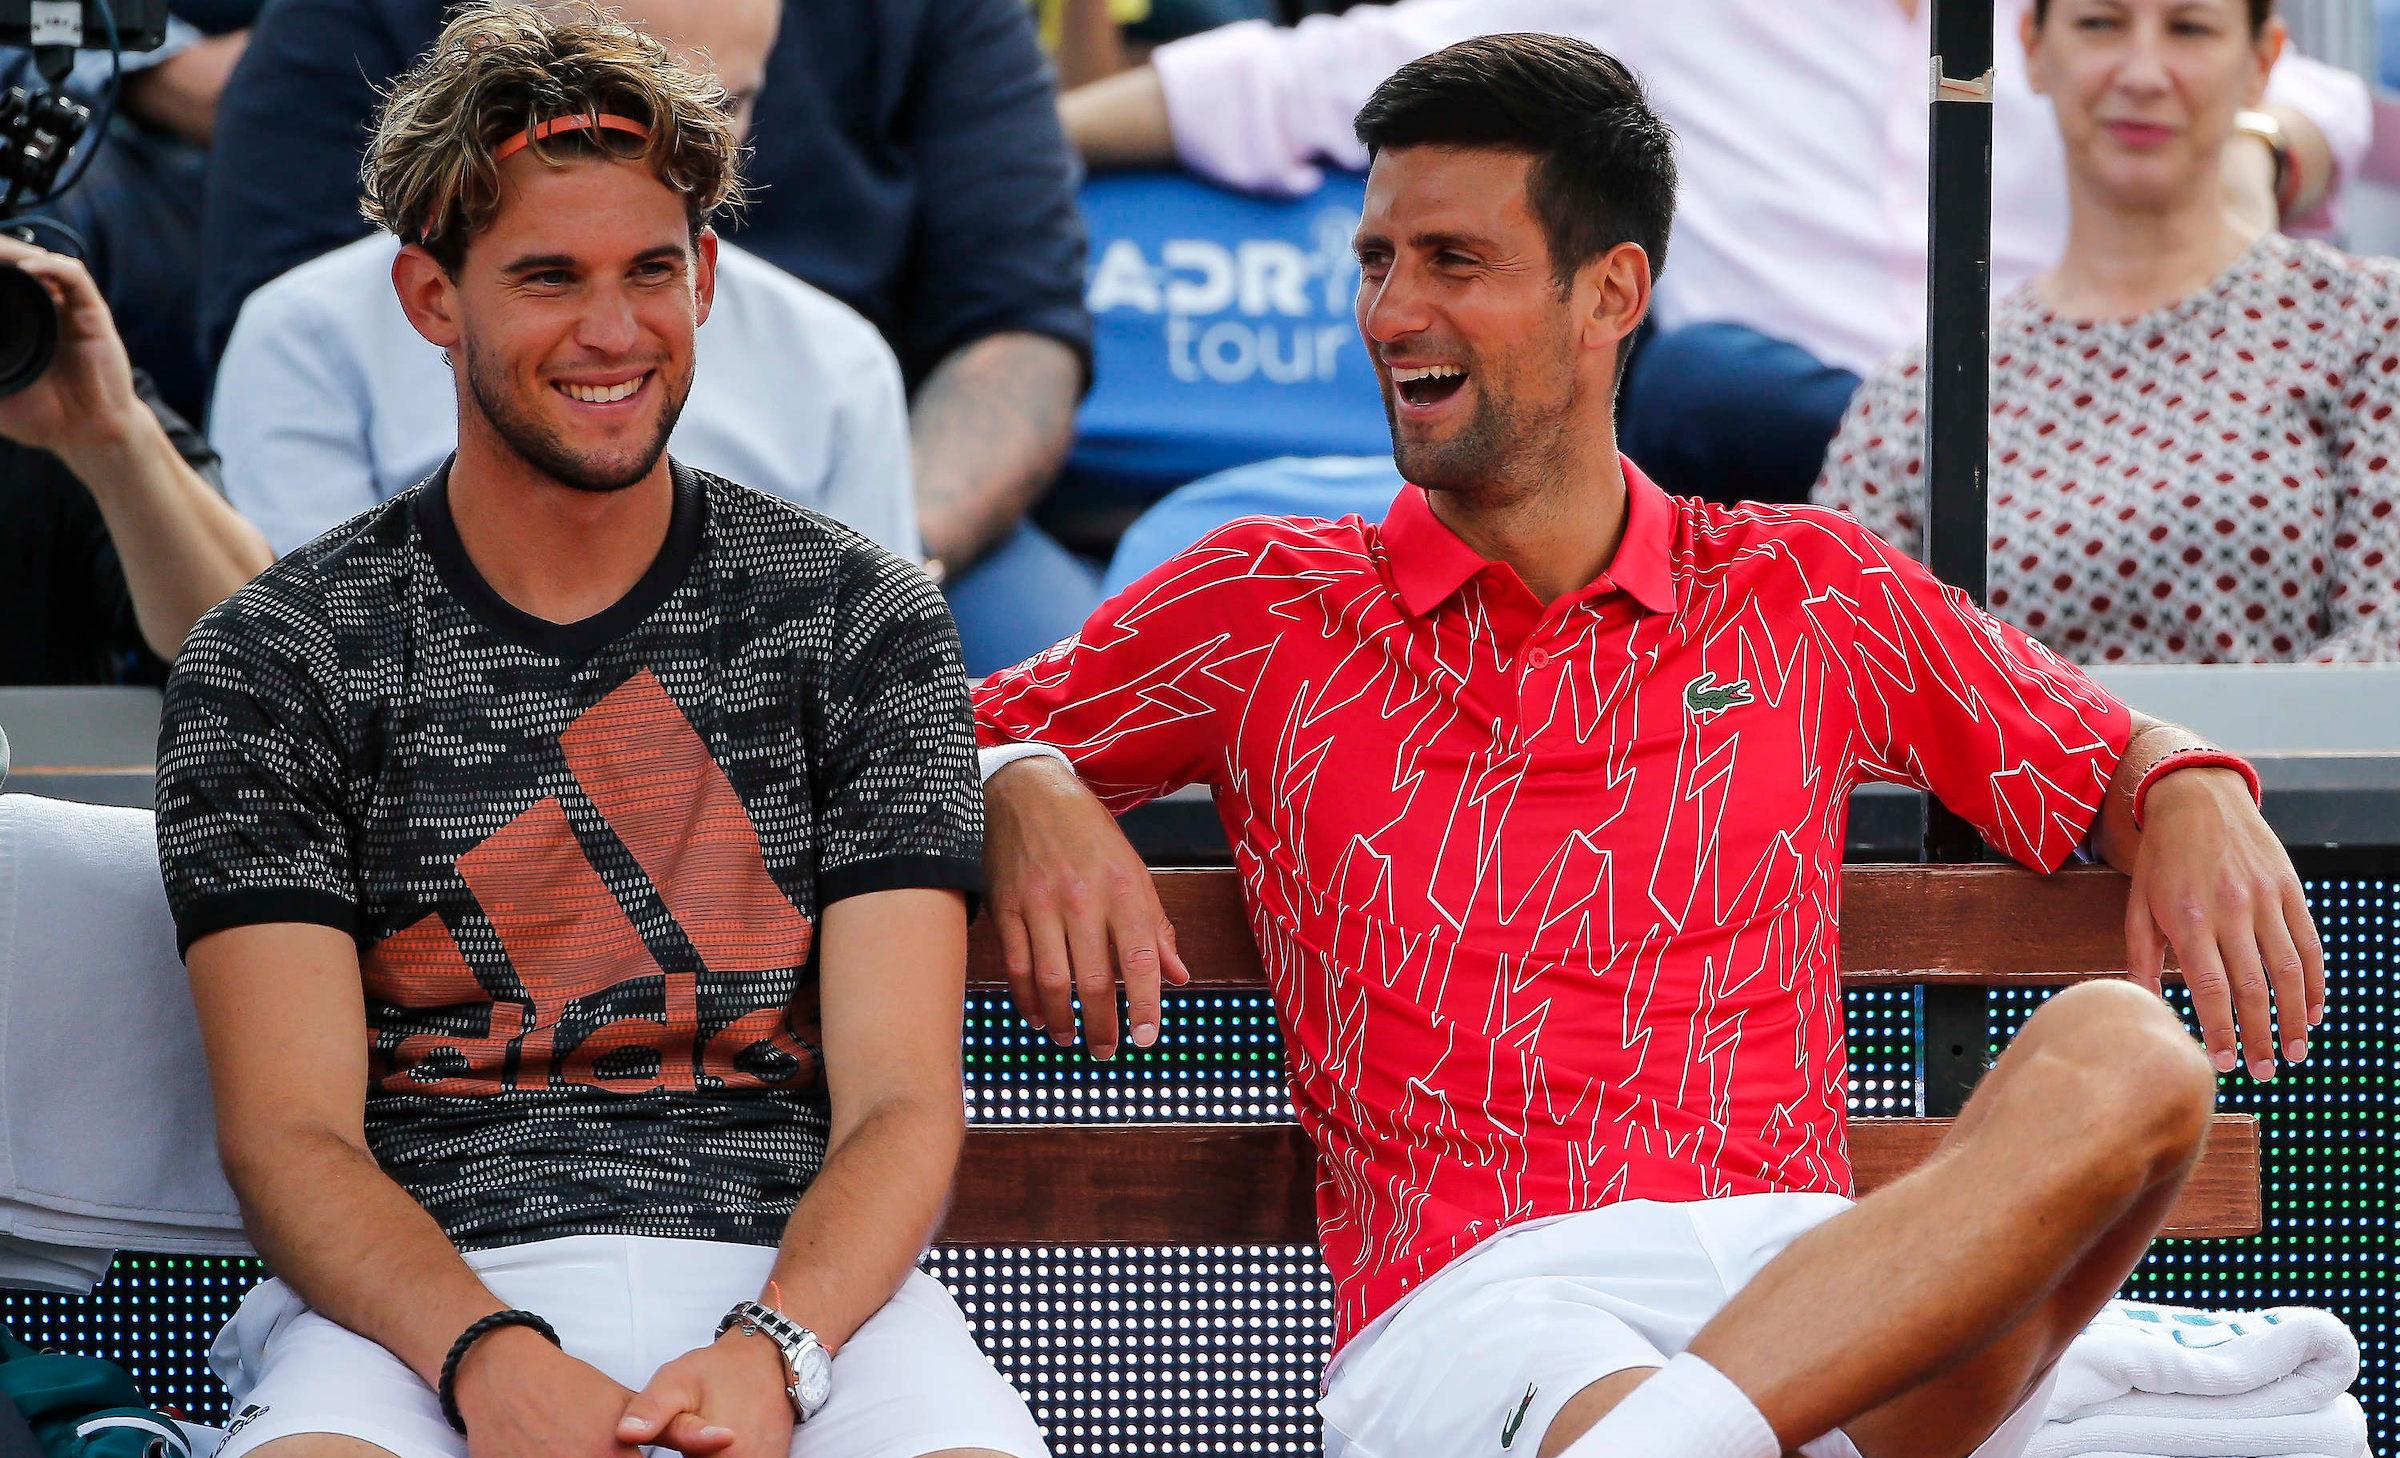 Dominic Thiem i Novak Djokovic (fot. Adria Tour)